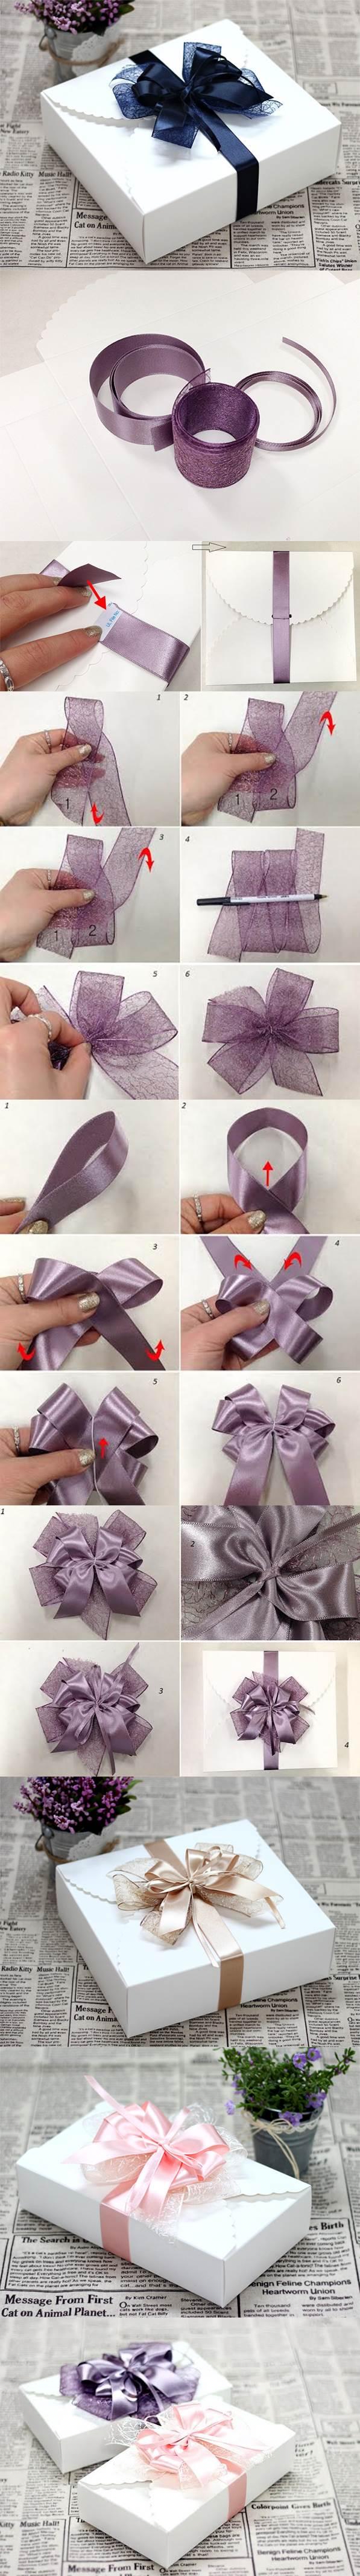 DIY Ribbon Bow for Gift Box Packaging 2